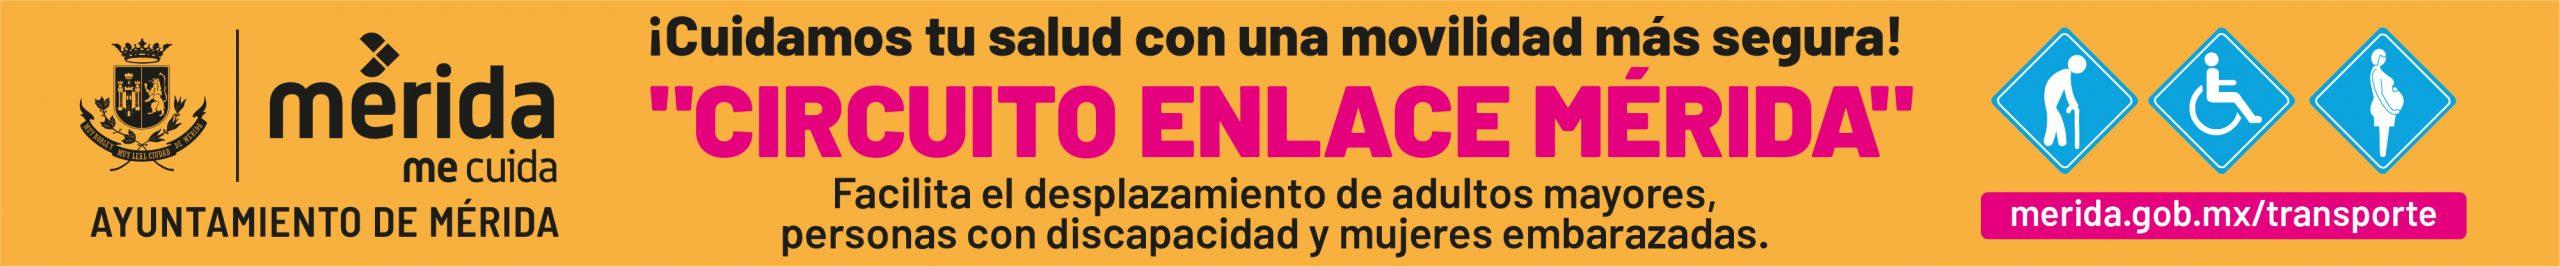 Banners Circuito Enlace_Revista Rural 960 x 100 px